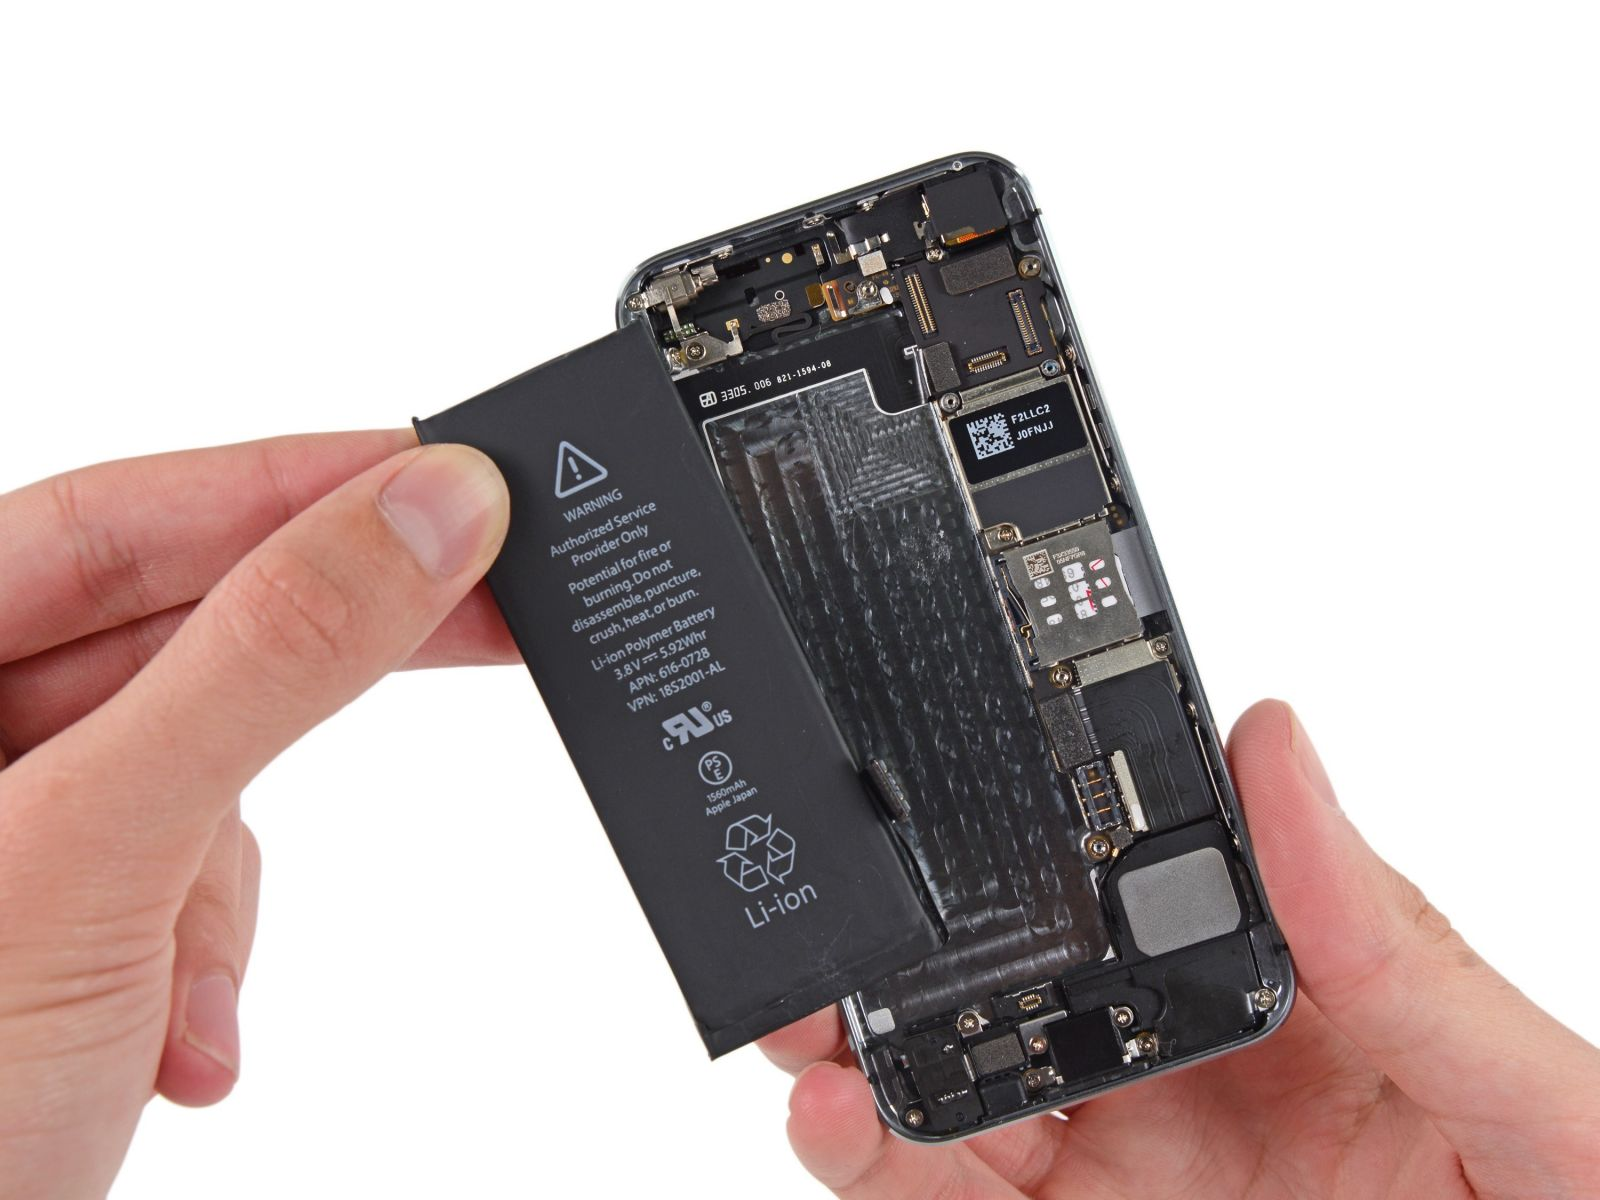 Замета аккумулятора на iPhone 5S (1)